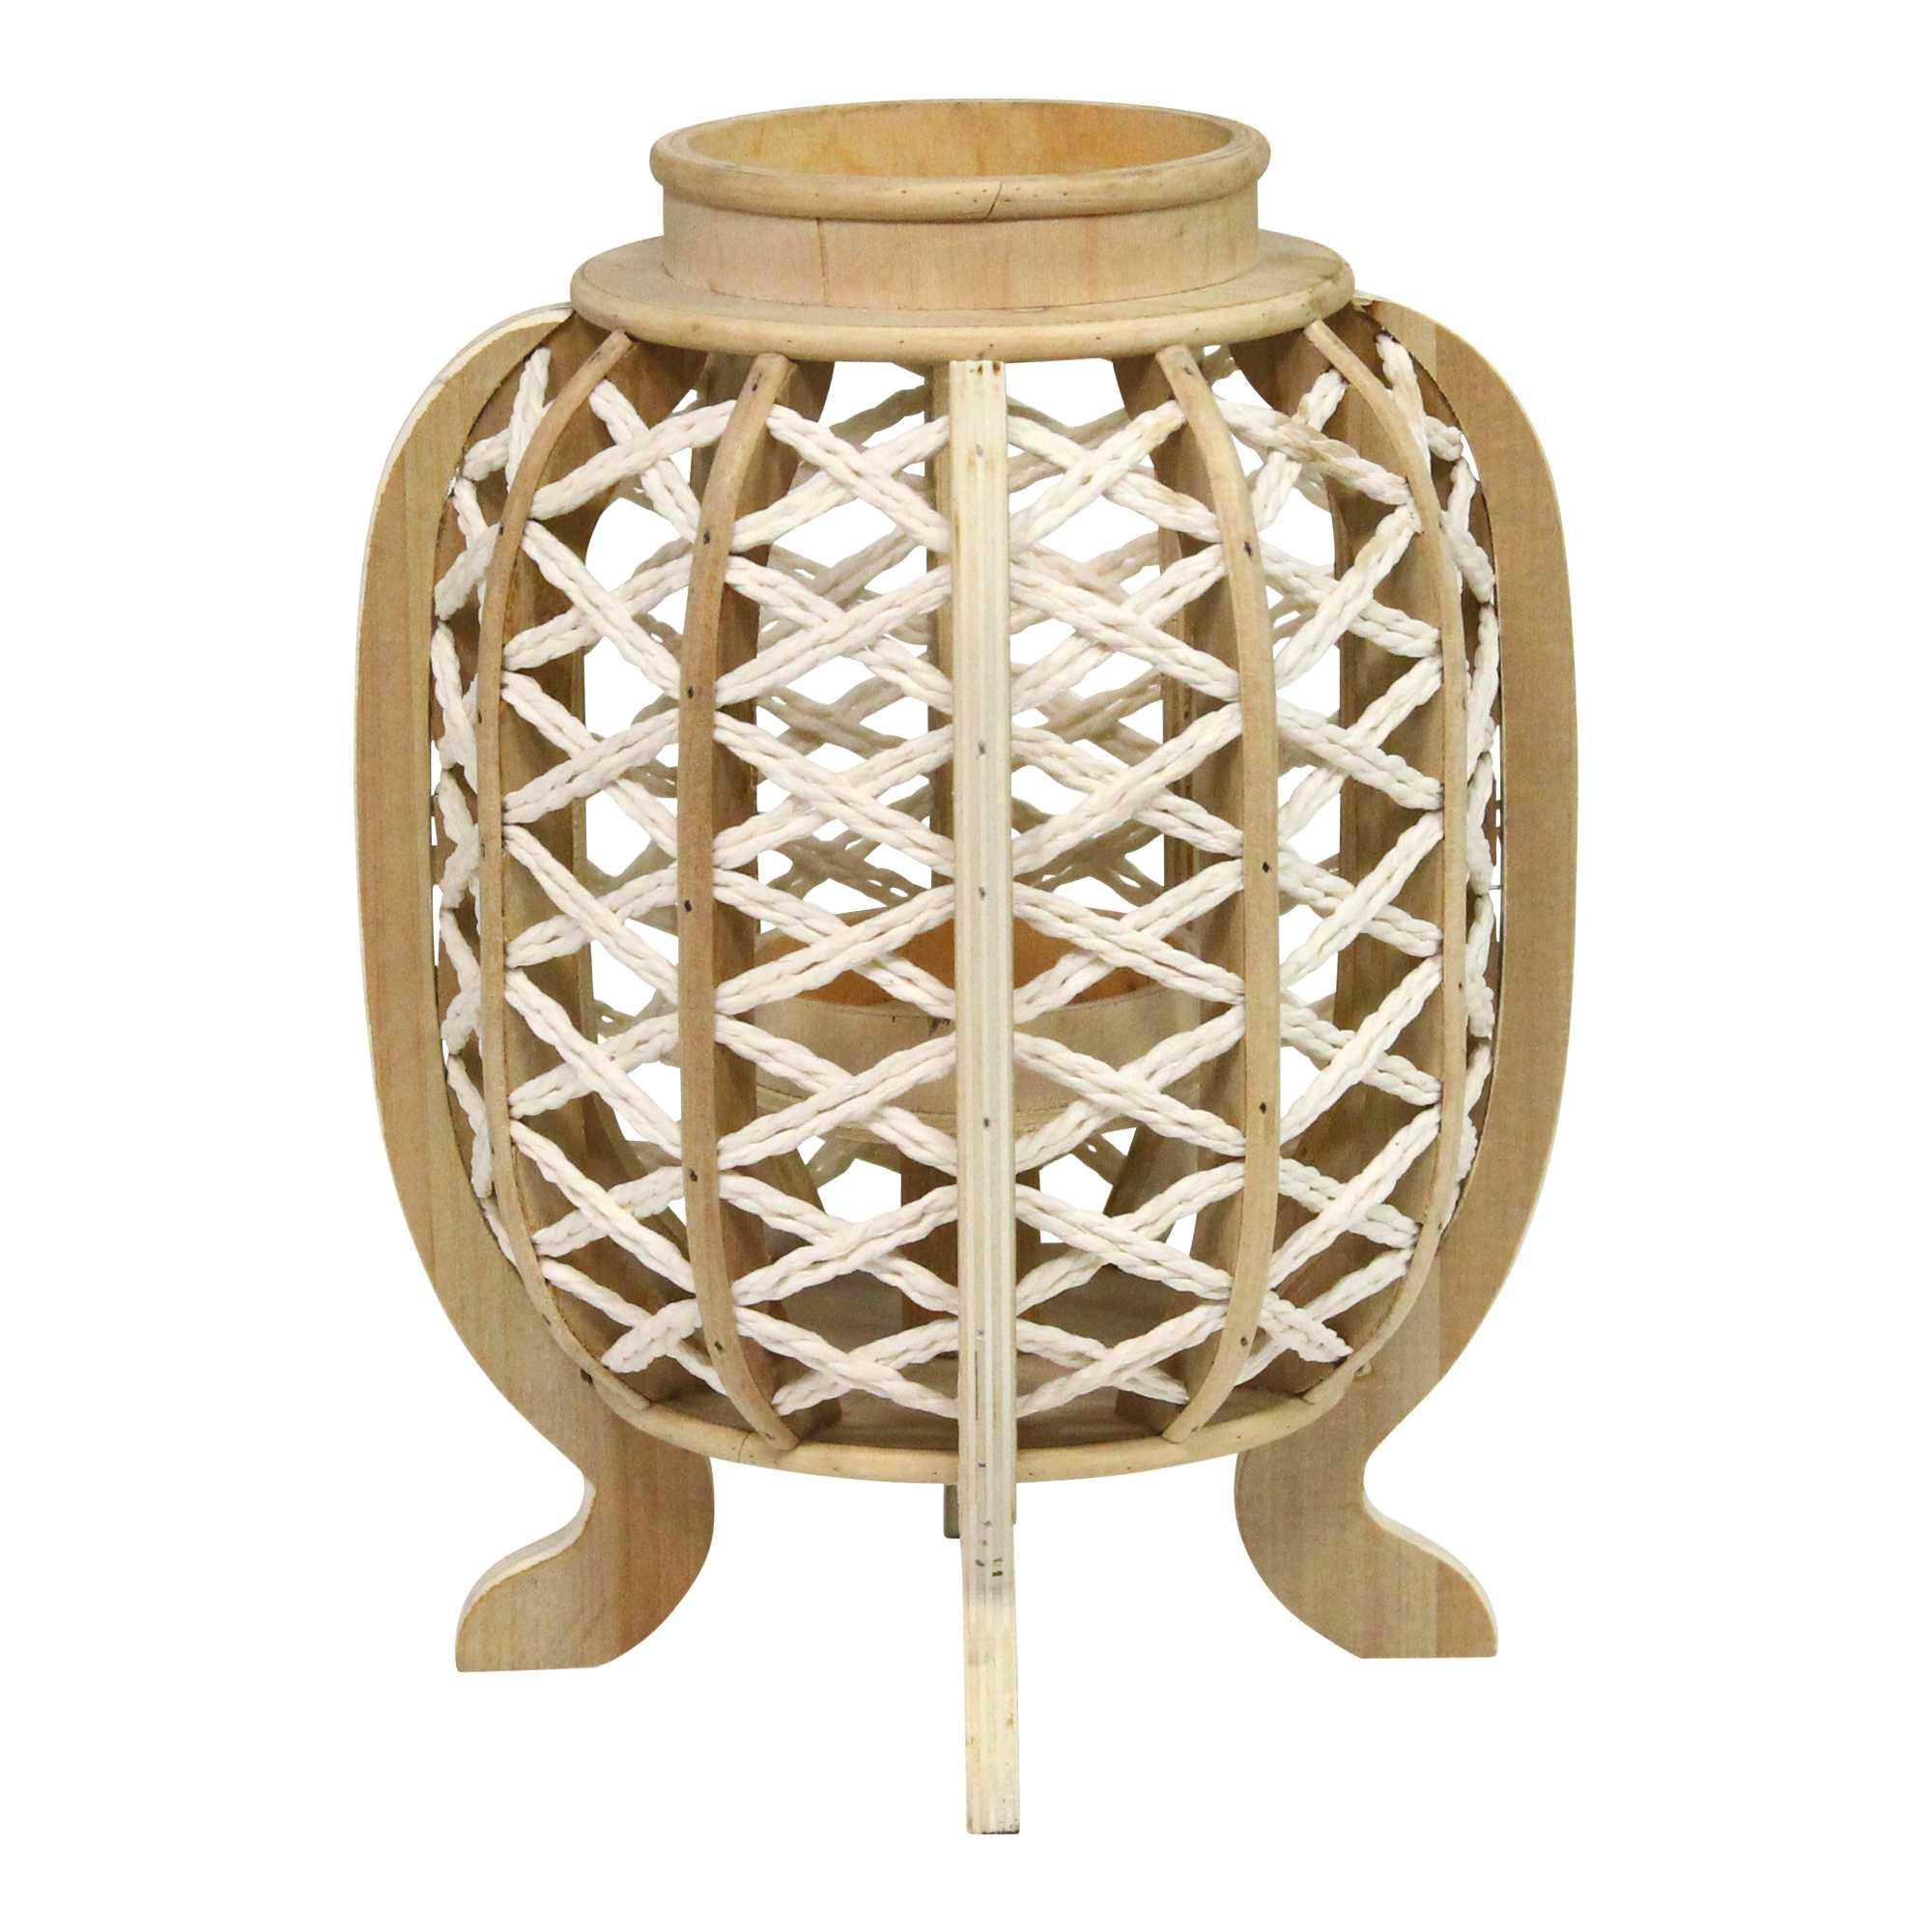 Carribean Style Bamboo and Wood Jute Lantern